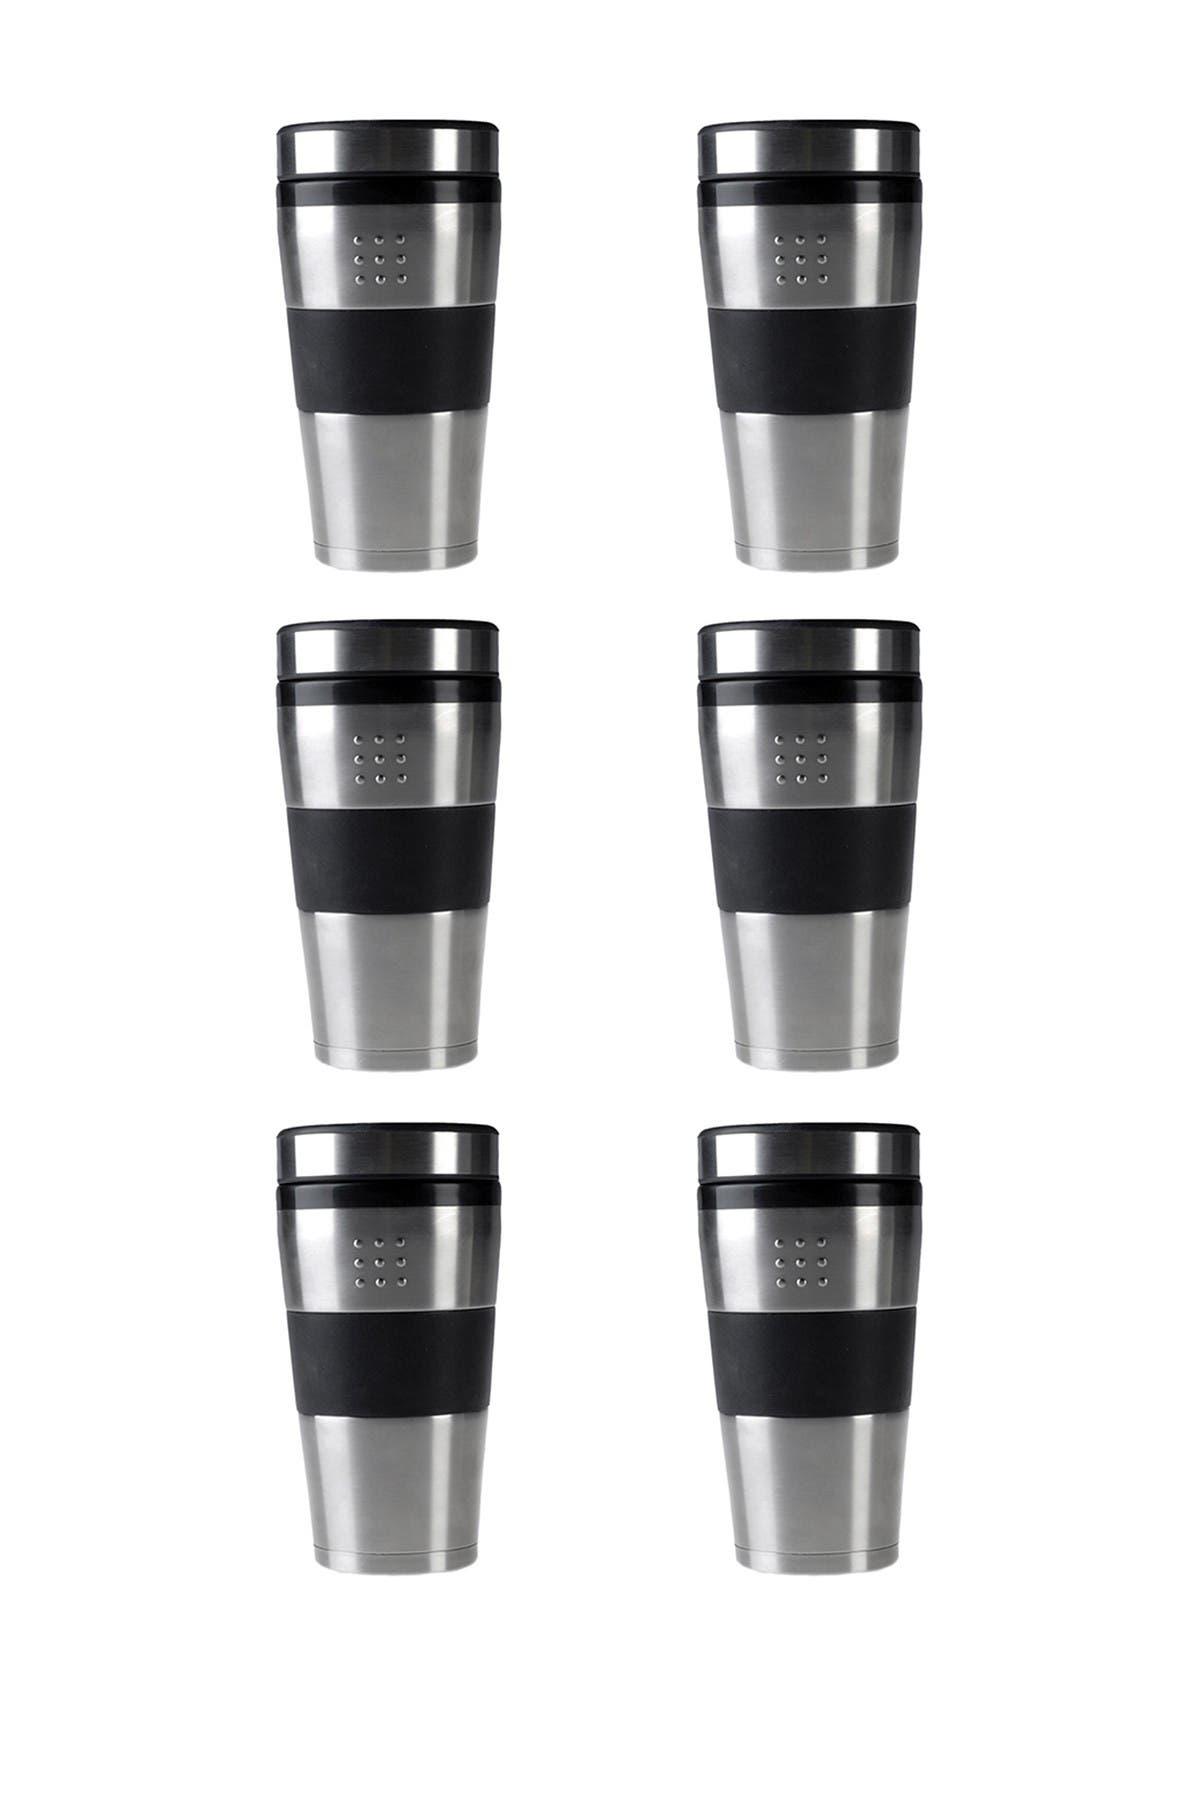 Berghoff Orion 16oz Stainless Steel Travel Mug Set Of 6 Nordstrom Rack